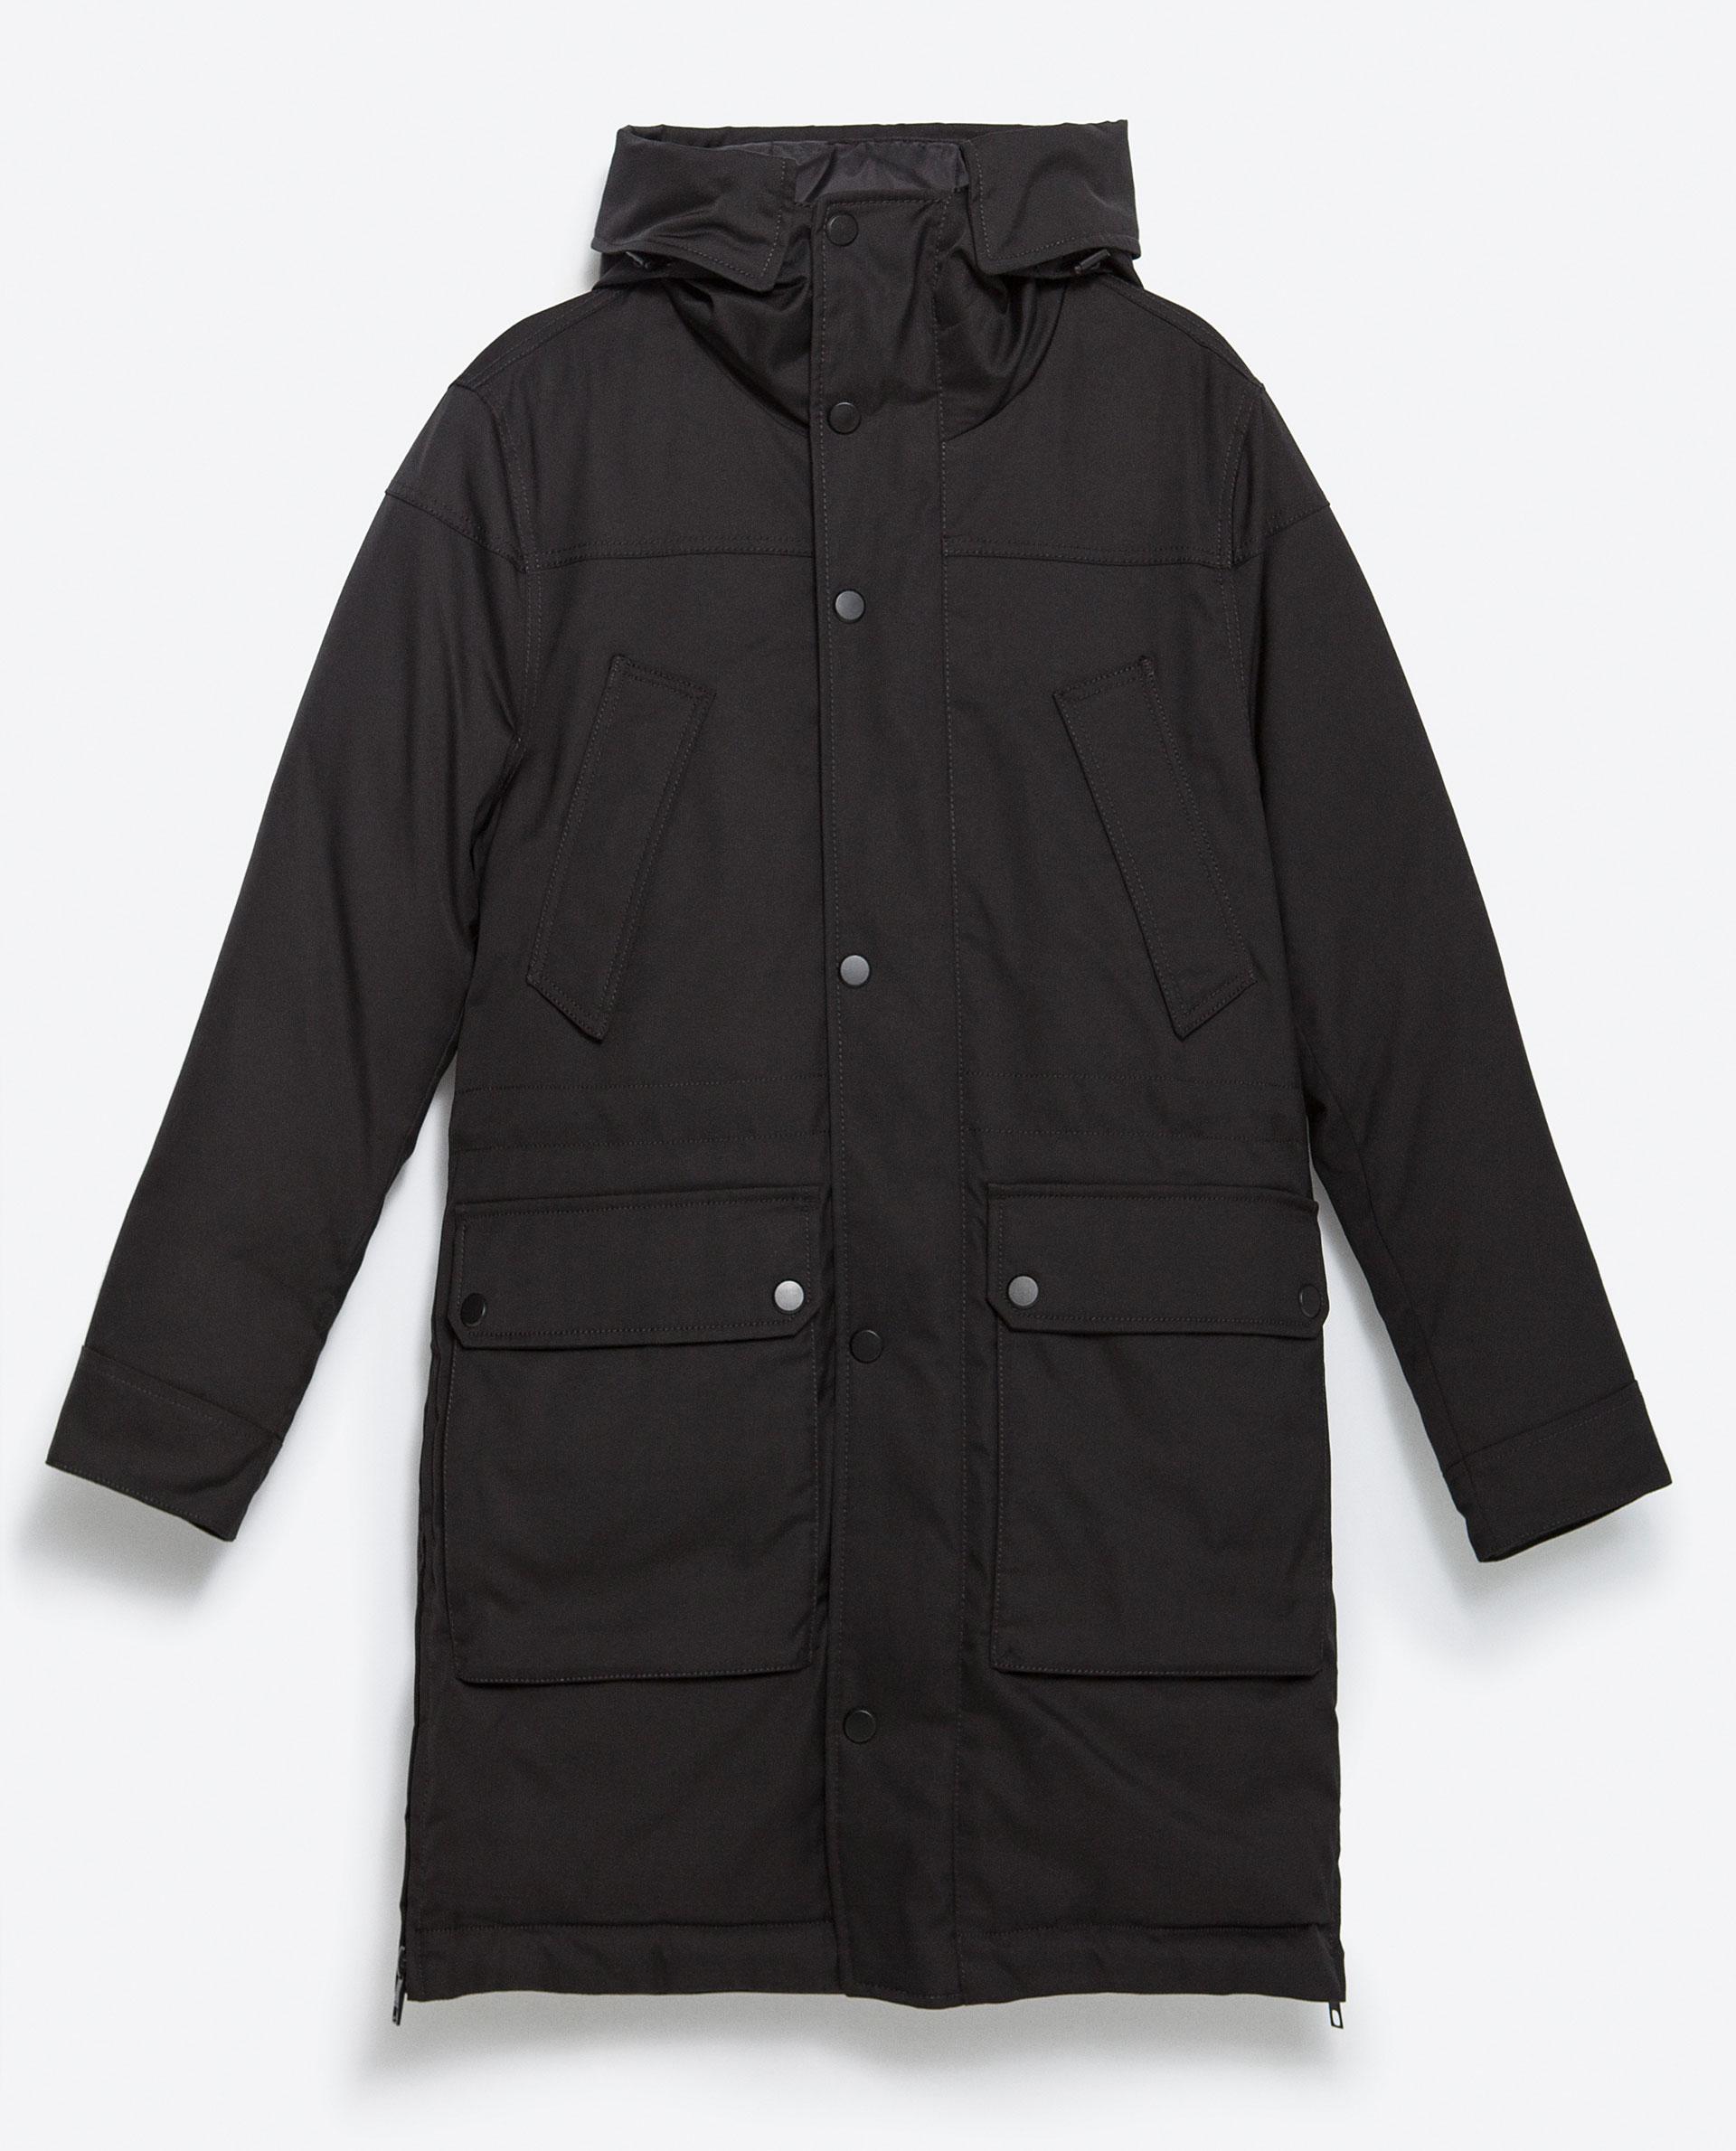 Zara Feather Three Quarter Length Jacket In Black For Men